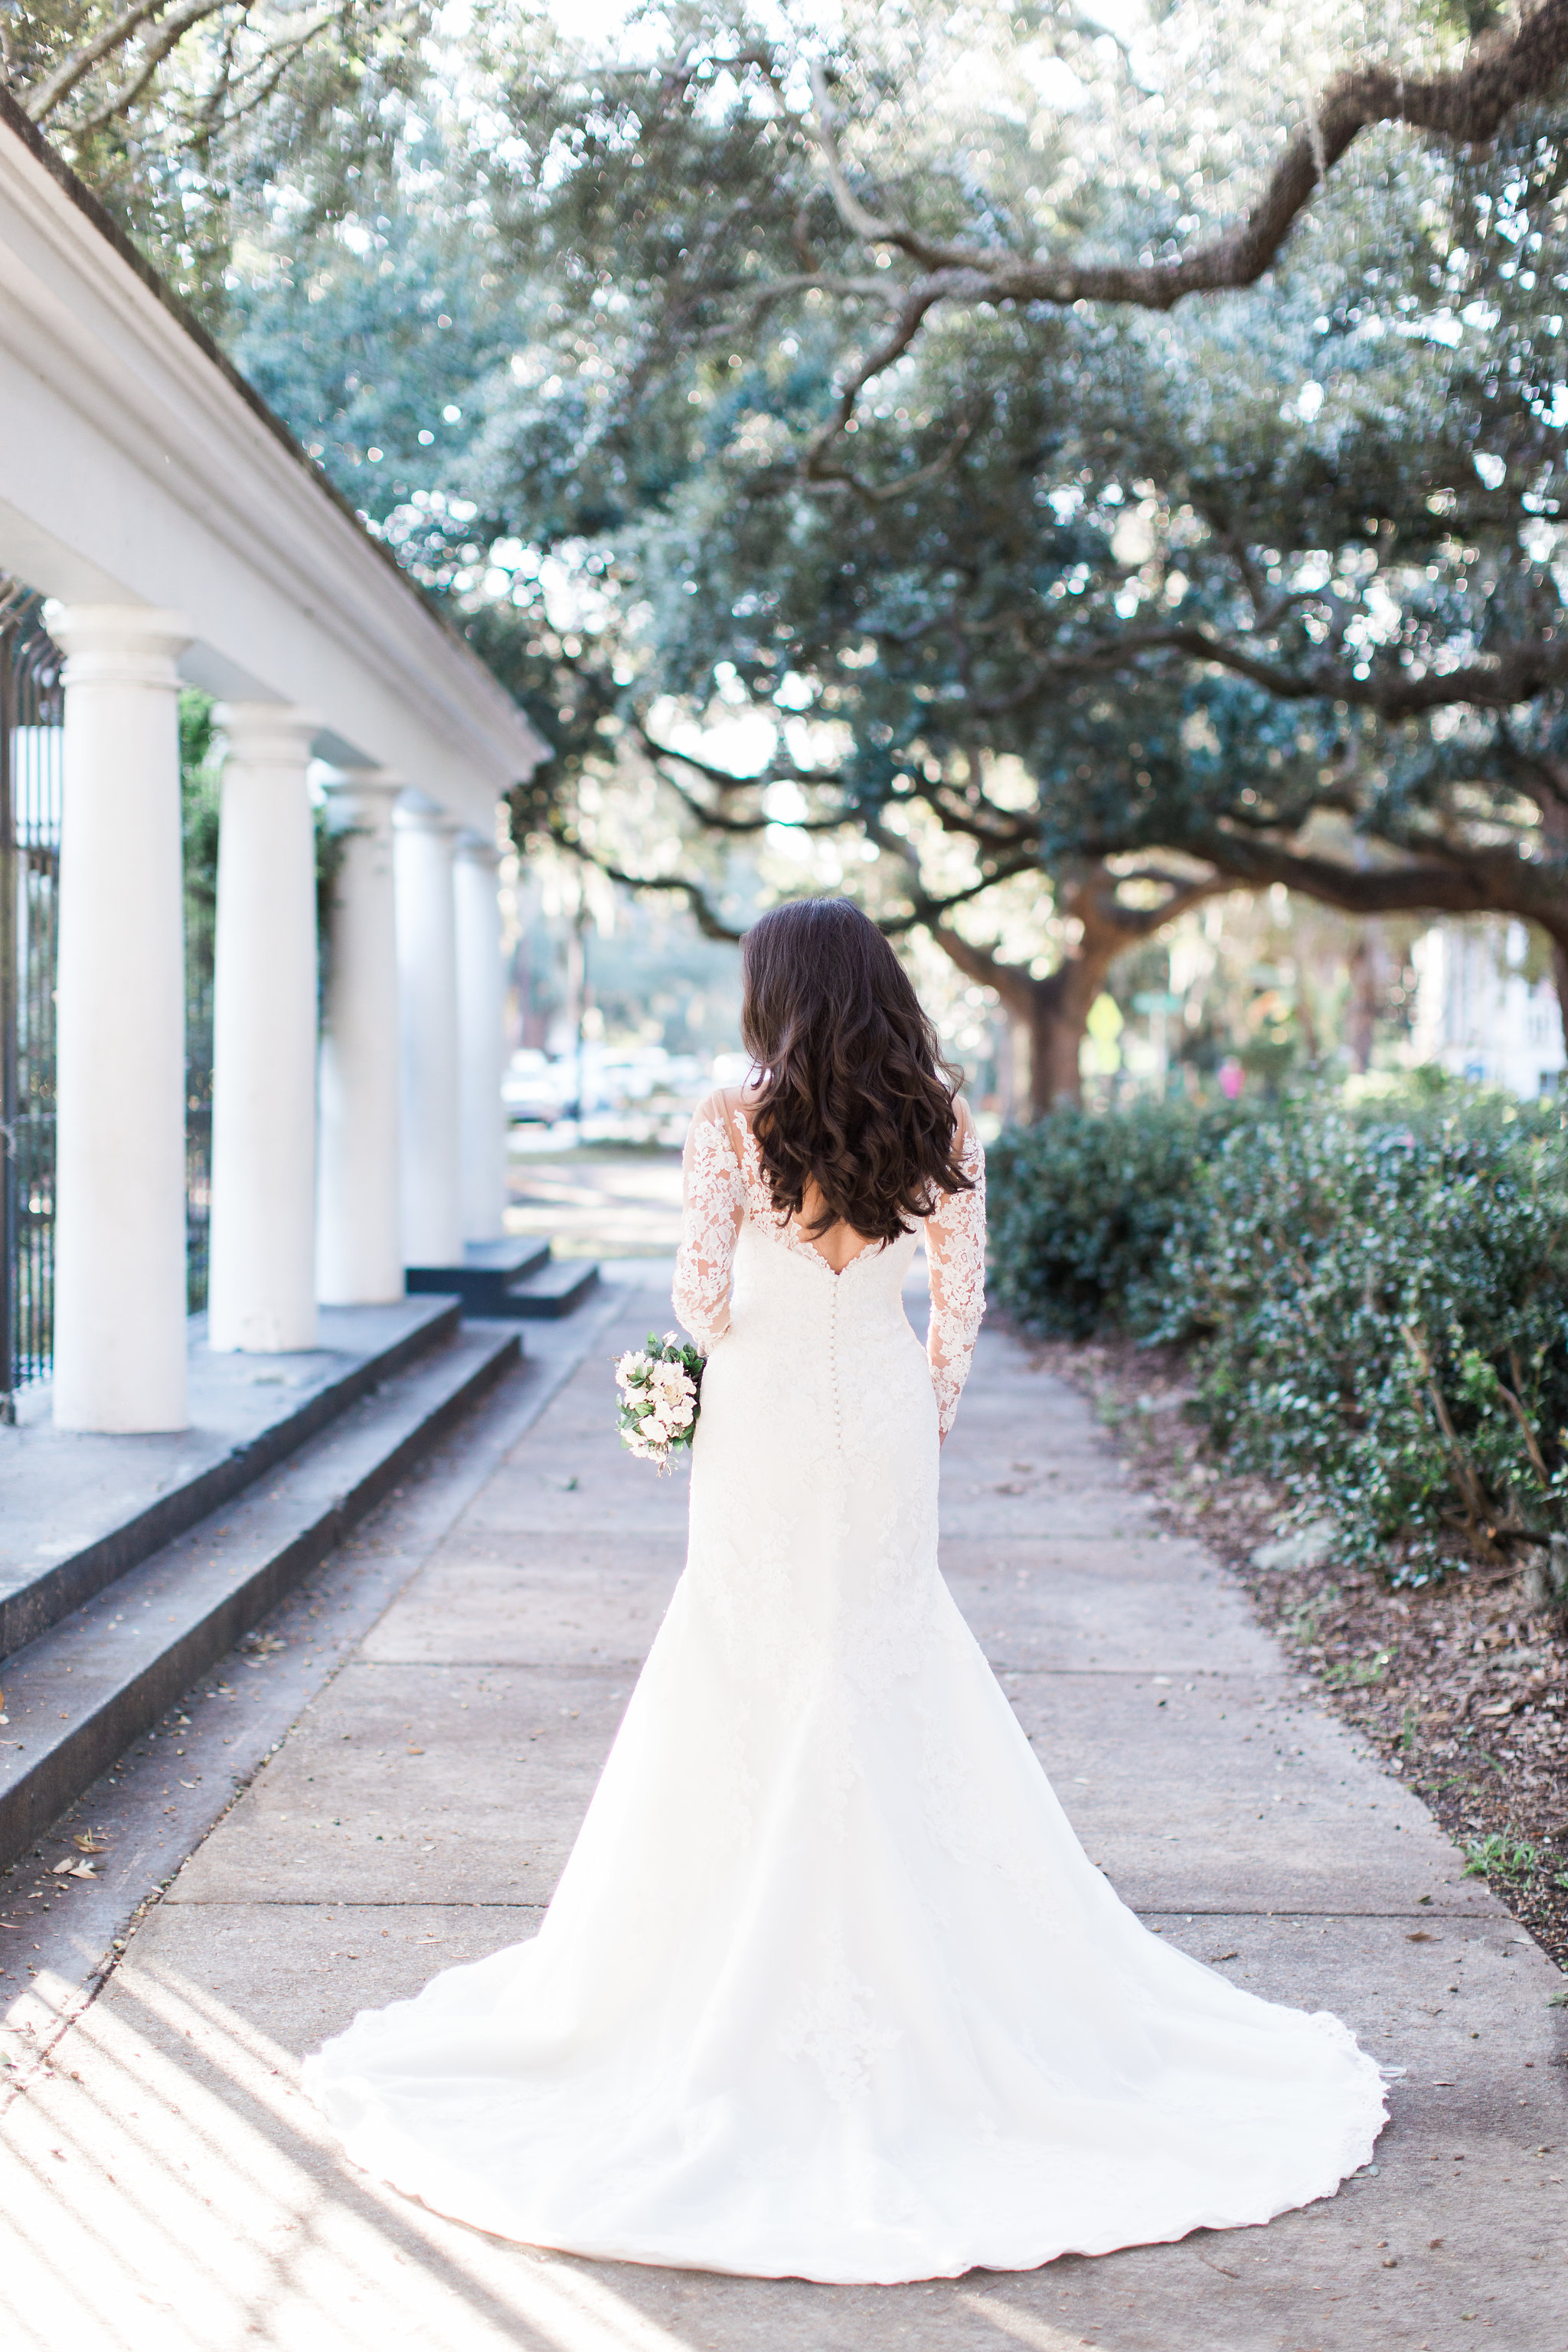 Rosie's Bridal Session in Forsyth Park Savannah, Georgia   Savannah Wedding Photographer   Apt. B Photography